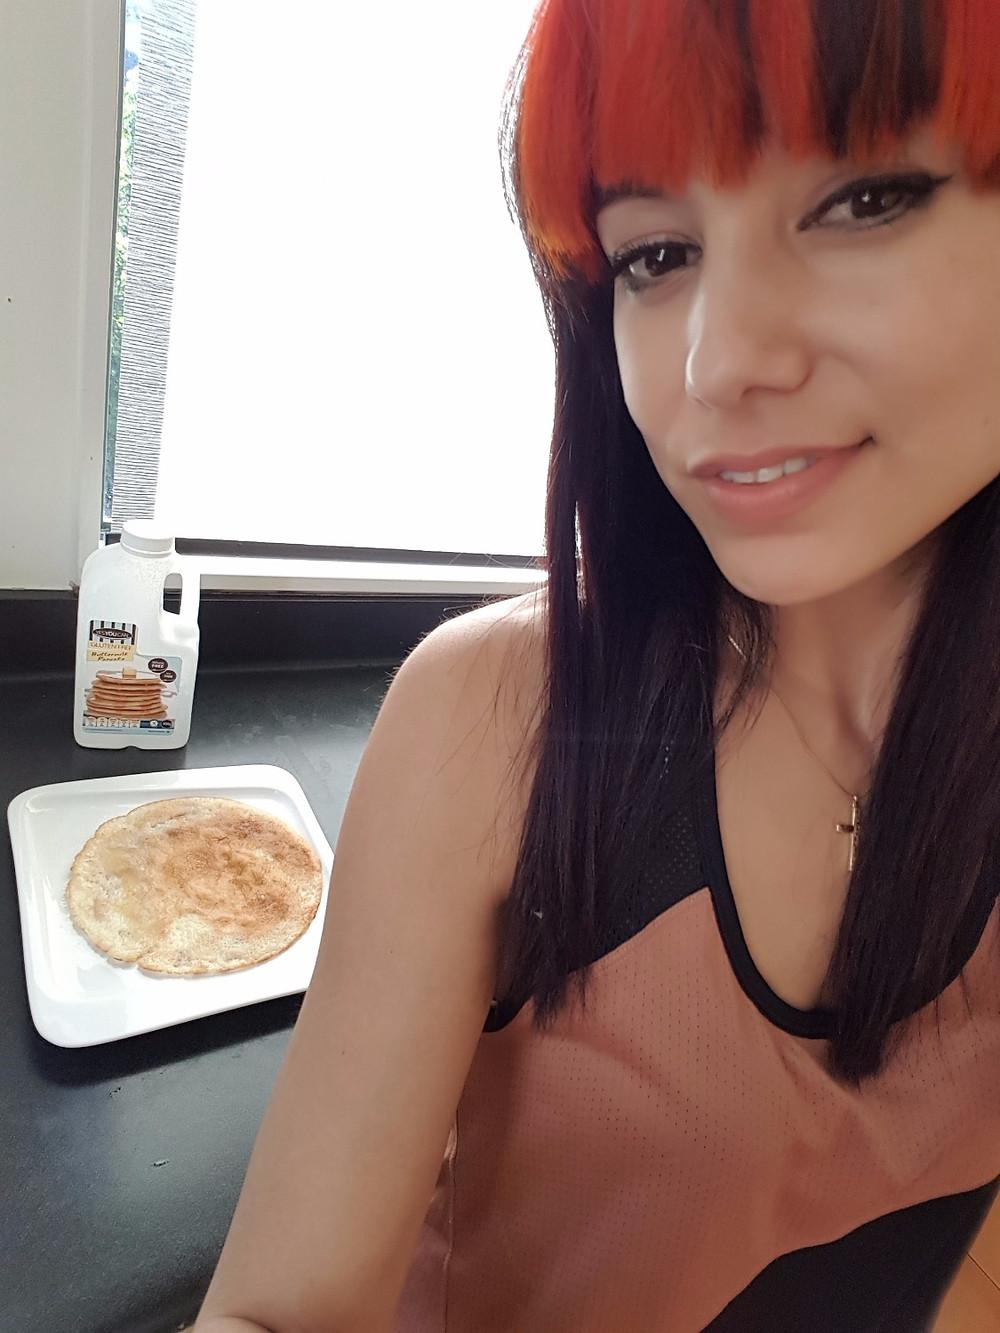 wellness mummy blogger binge eating weekend overeating diet fitness gluten free pancakes